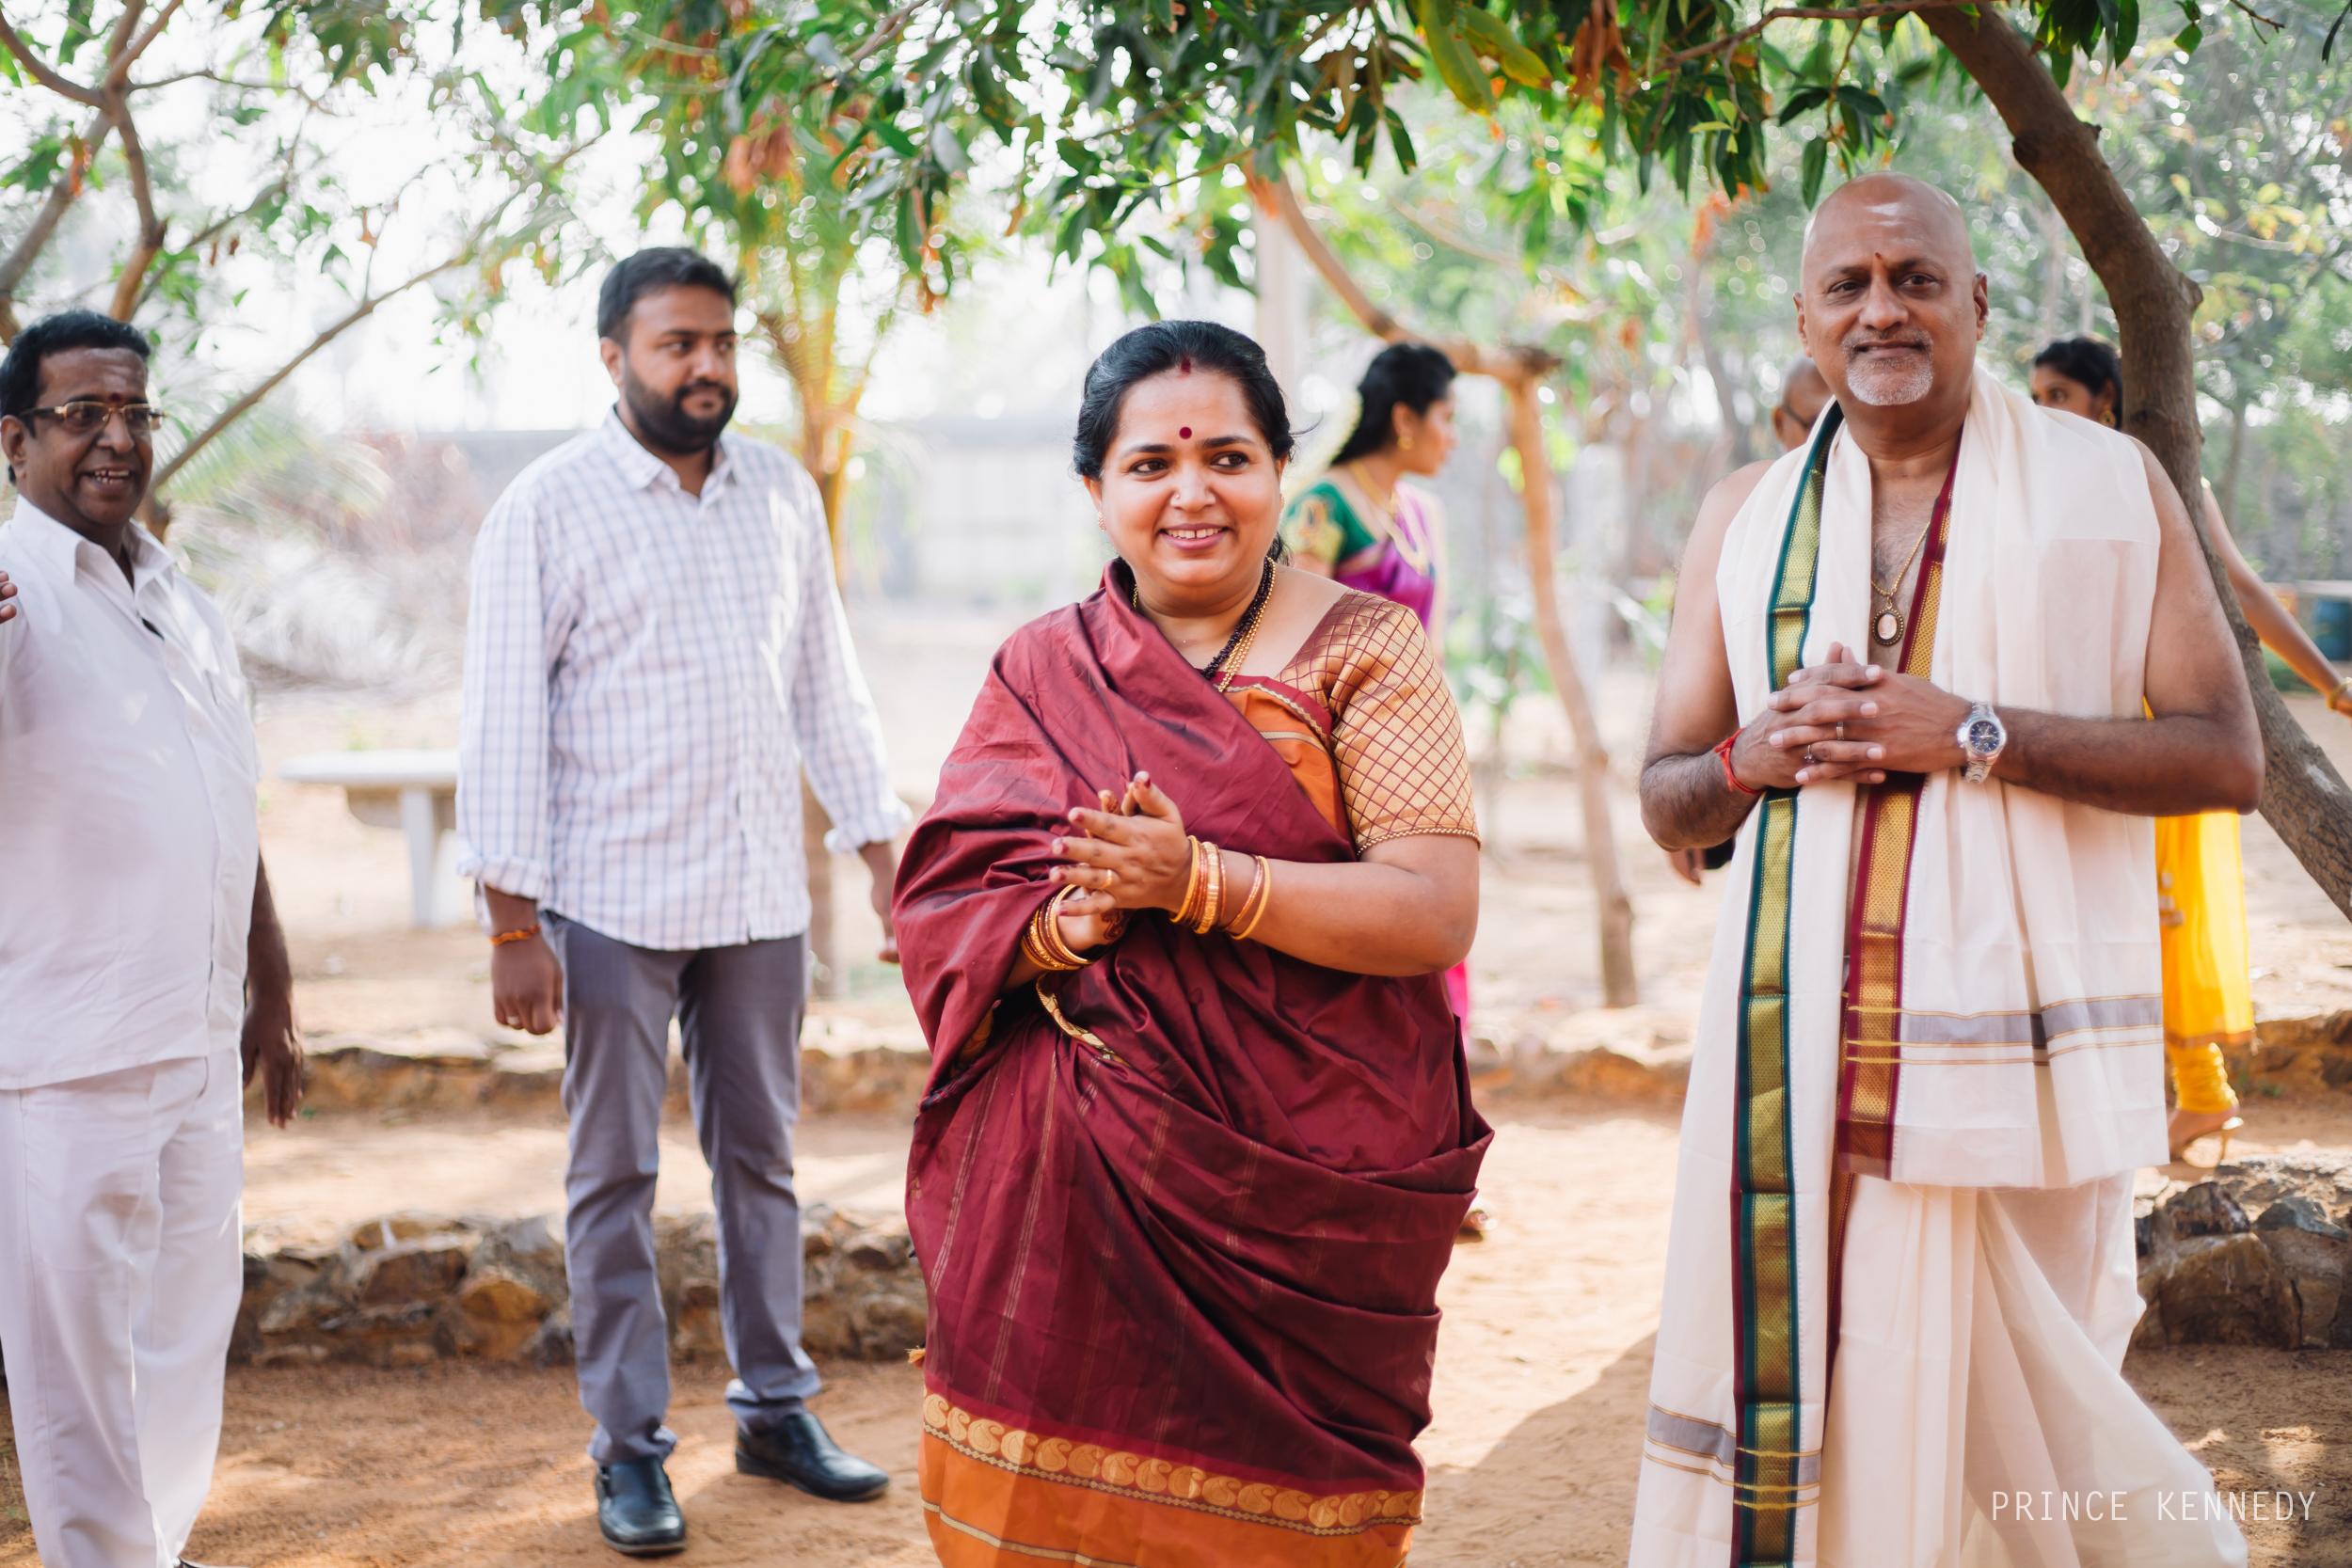 Athmajja-Nithesh-Engagement-Couple-Portrait-Portraiture-Wedding-Couple-Portrait-Chennai-Photographer-Candid-Photography-Destination-Best-Prince-Kennedy-Photography-28.jpg